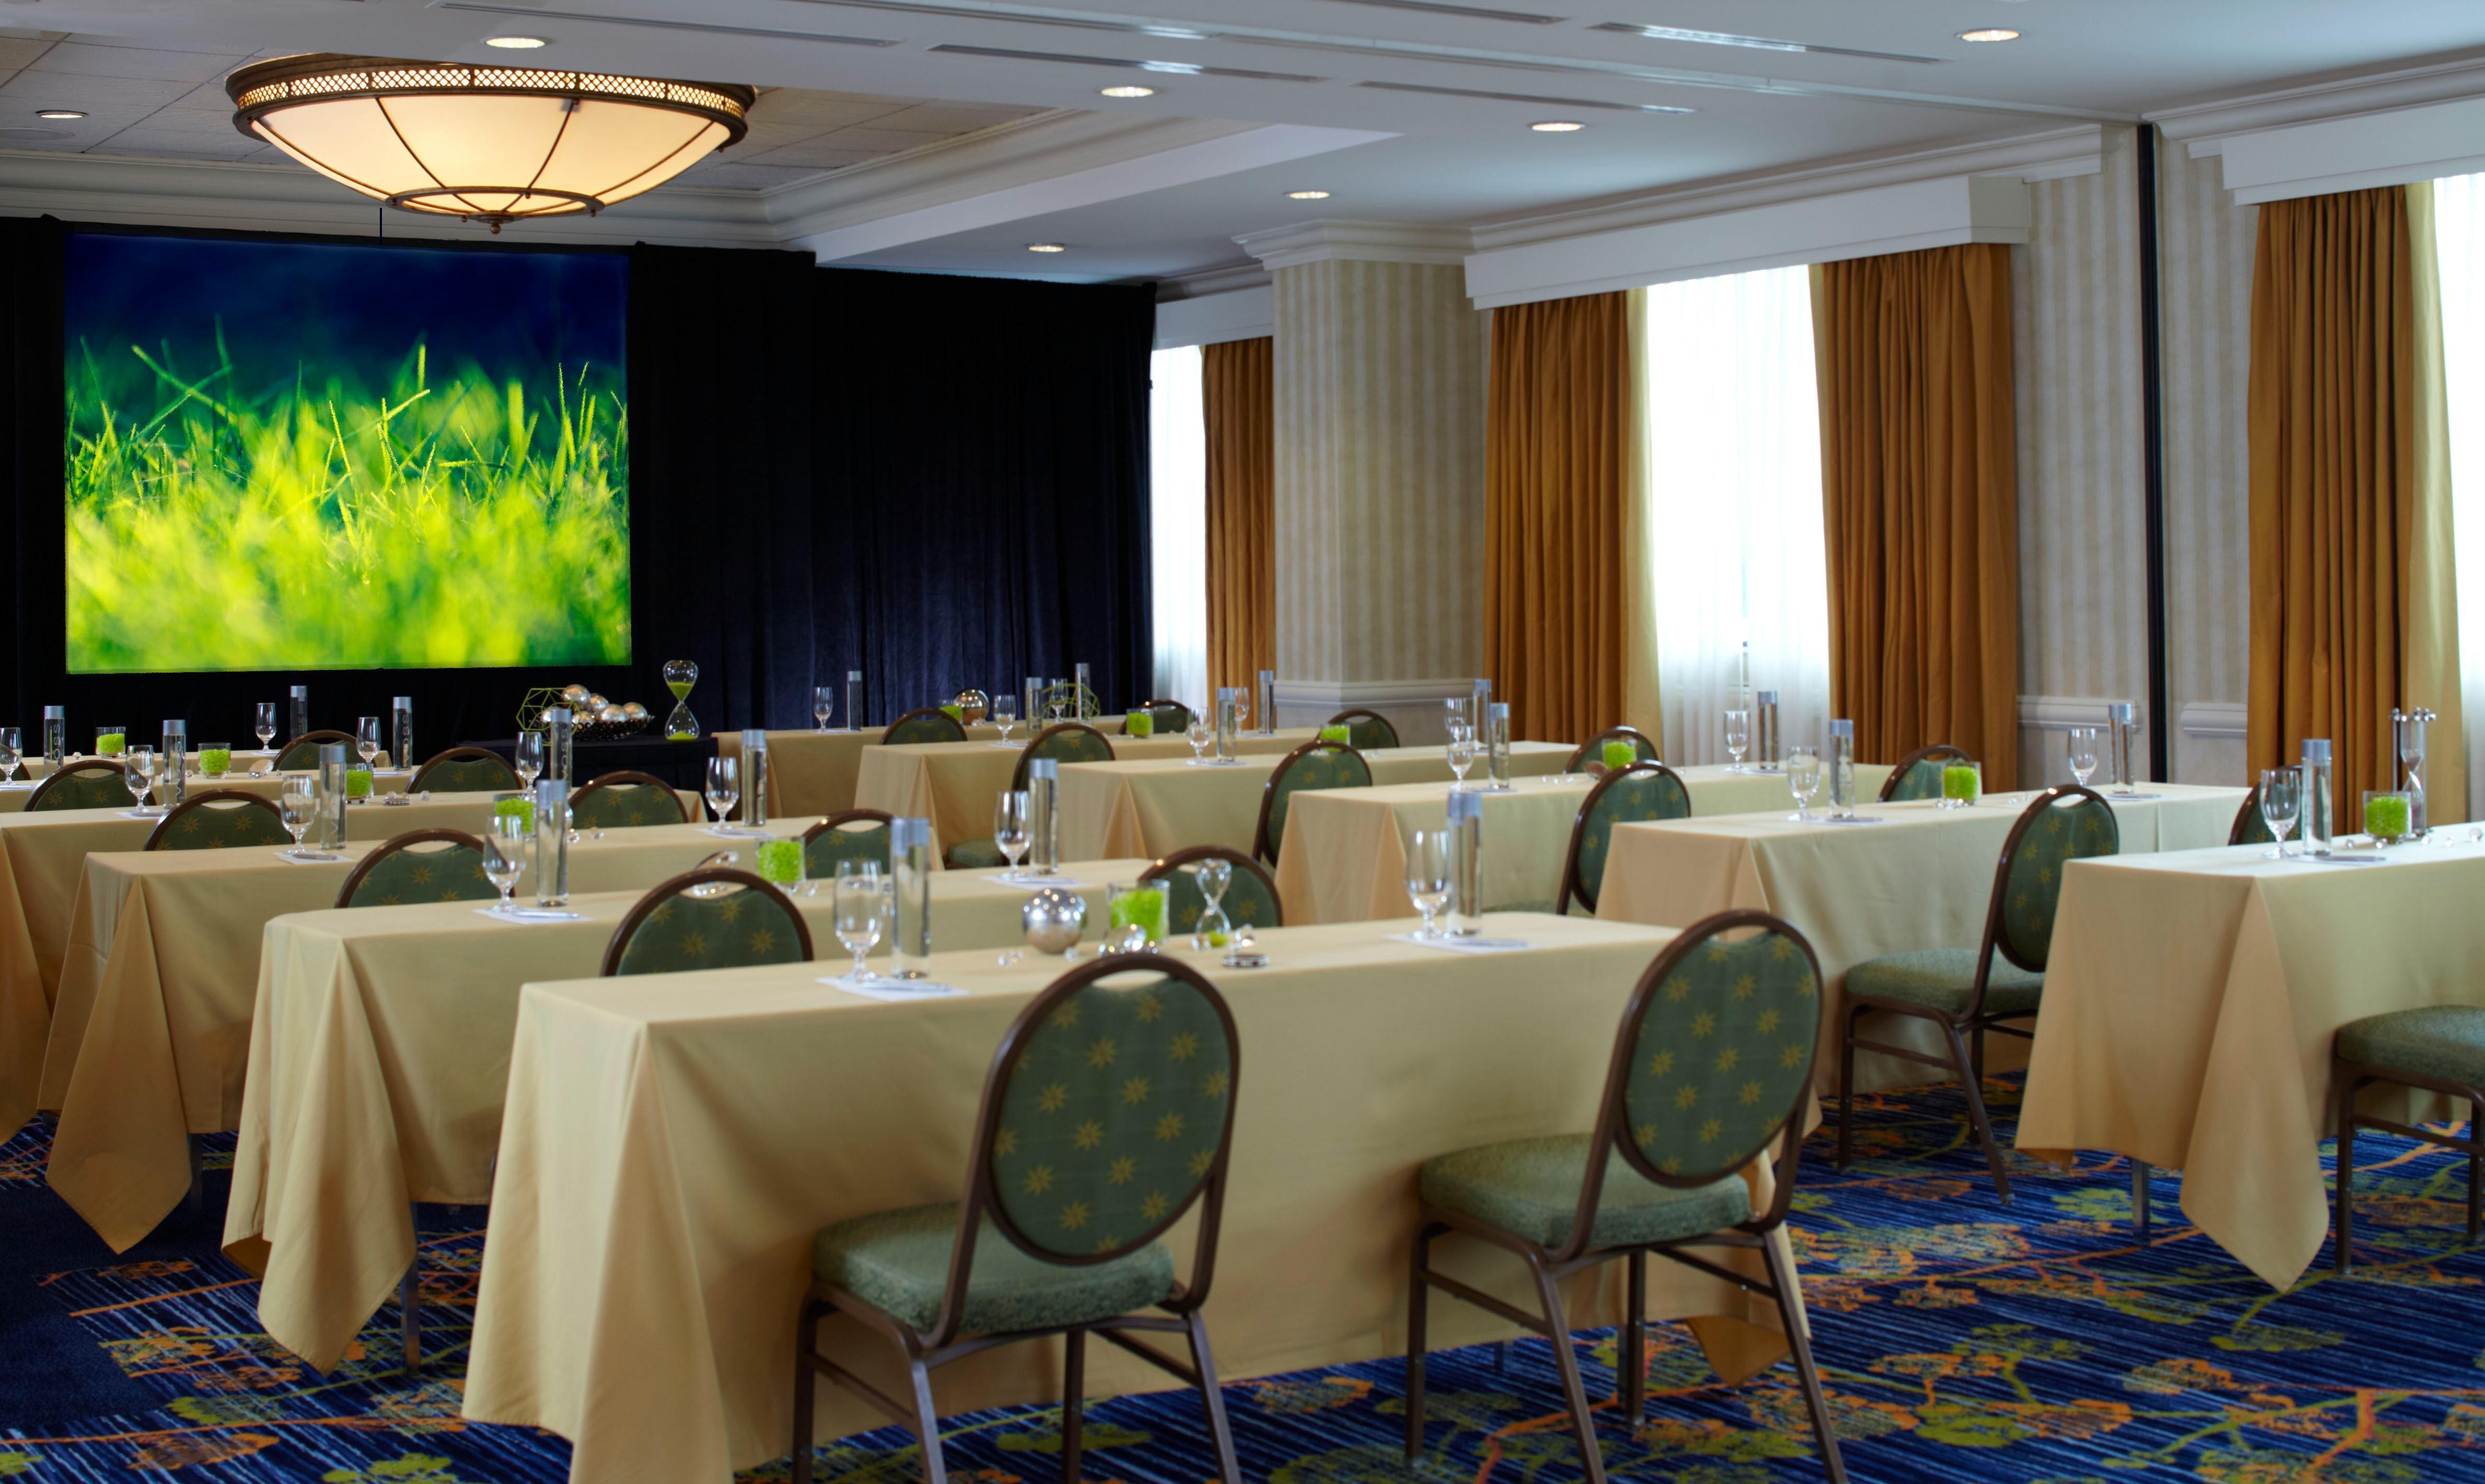 Renaissance Fort Lauderdale Cruise Port Hotel image 27